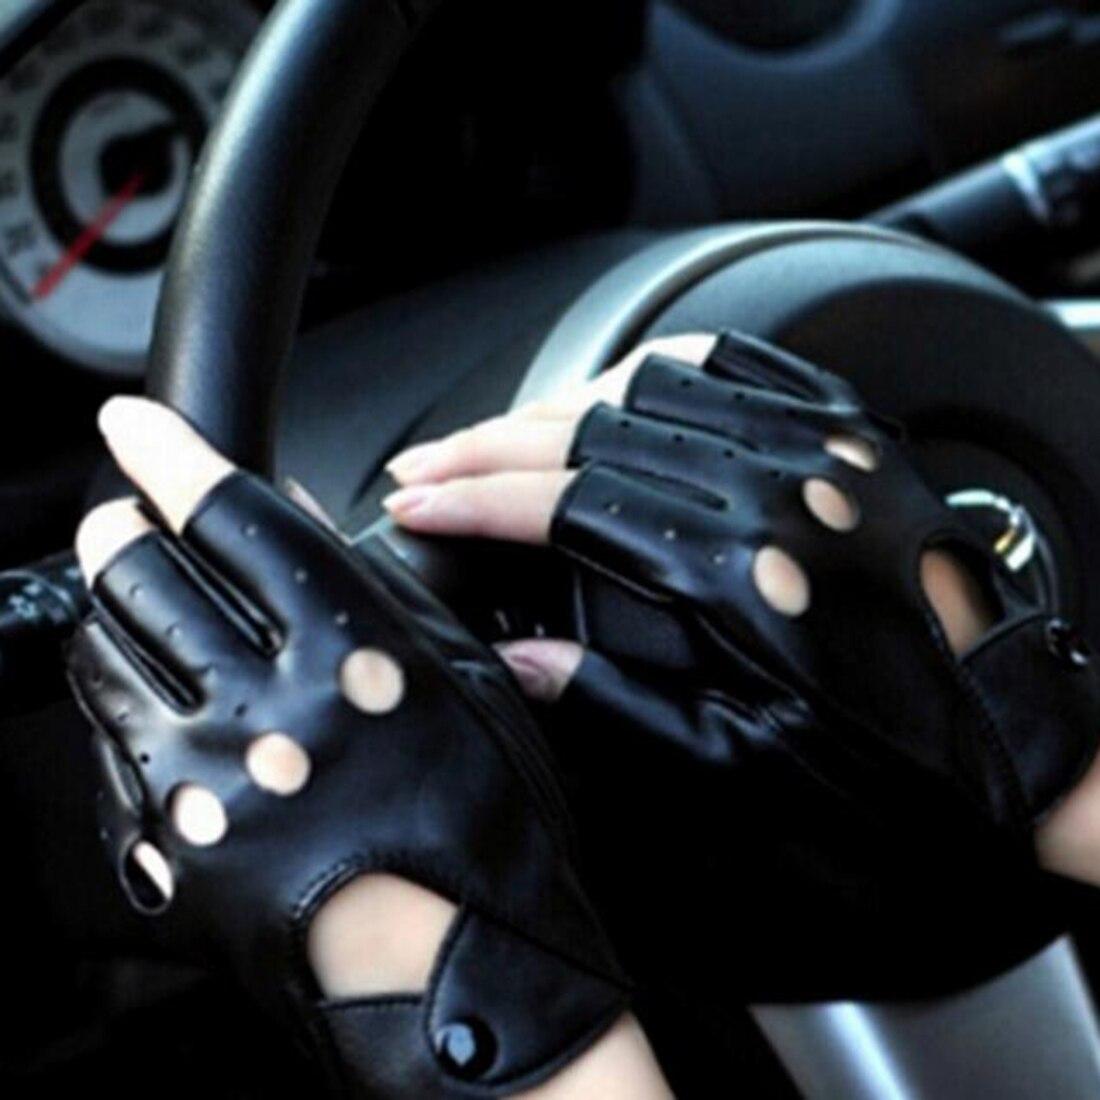 Comfortable 1Pair Fashion Half Finger Driving Women Gloves PU Leather Fingerless Gloves For Women Black